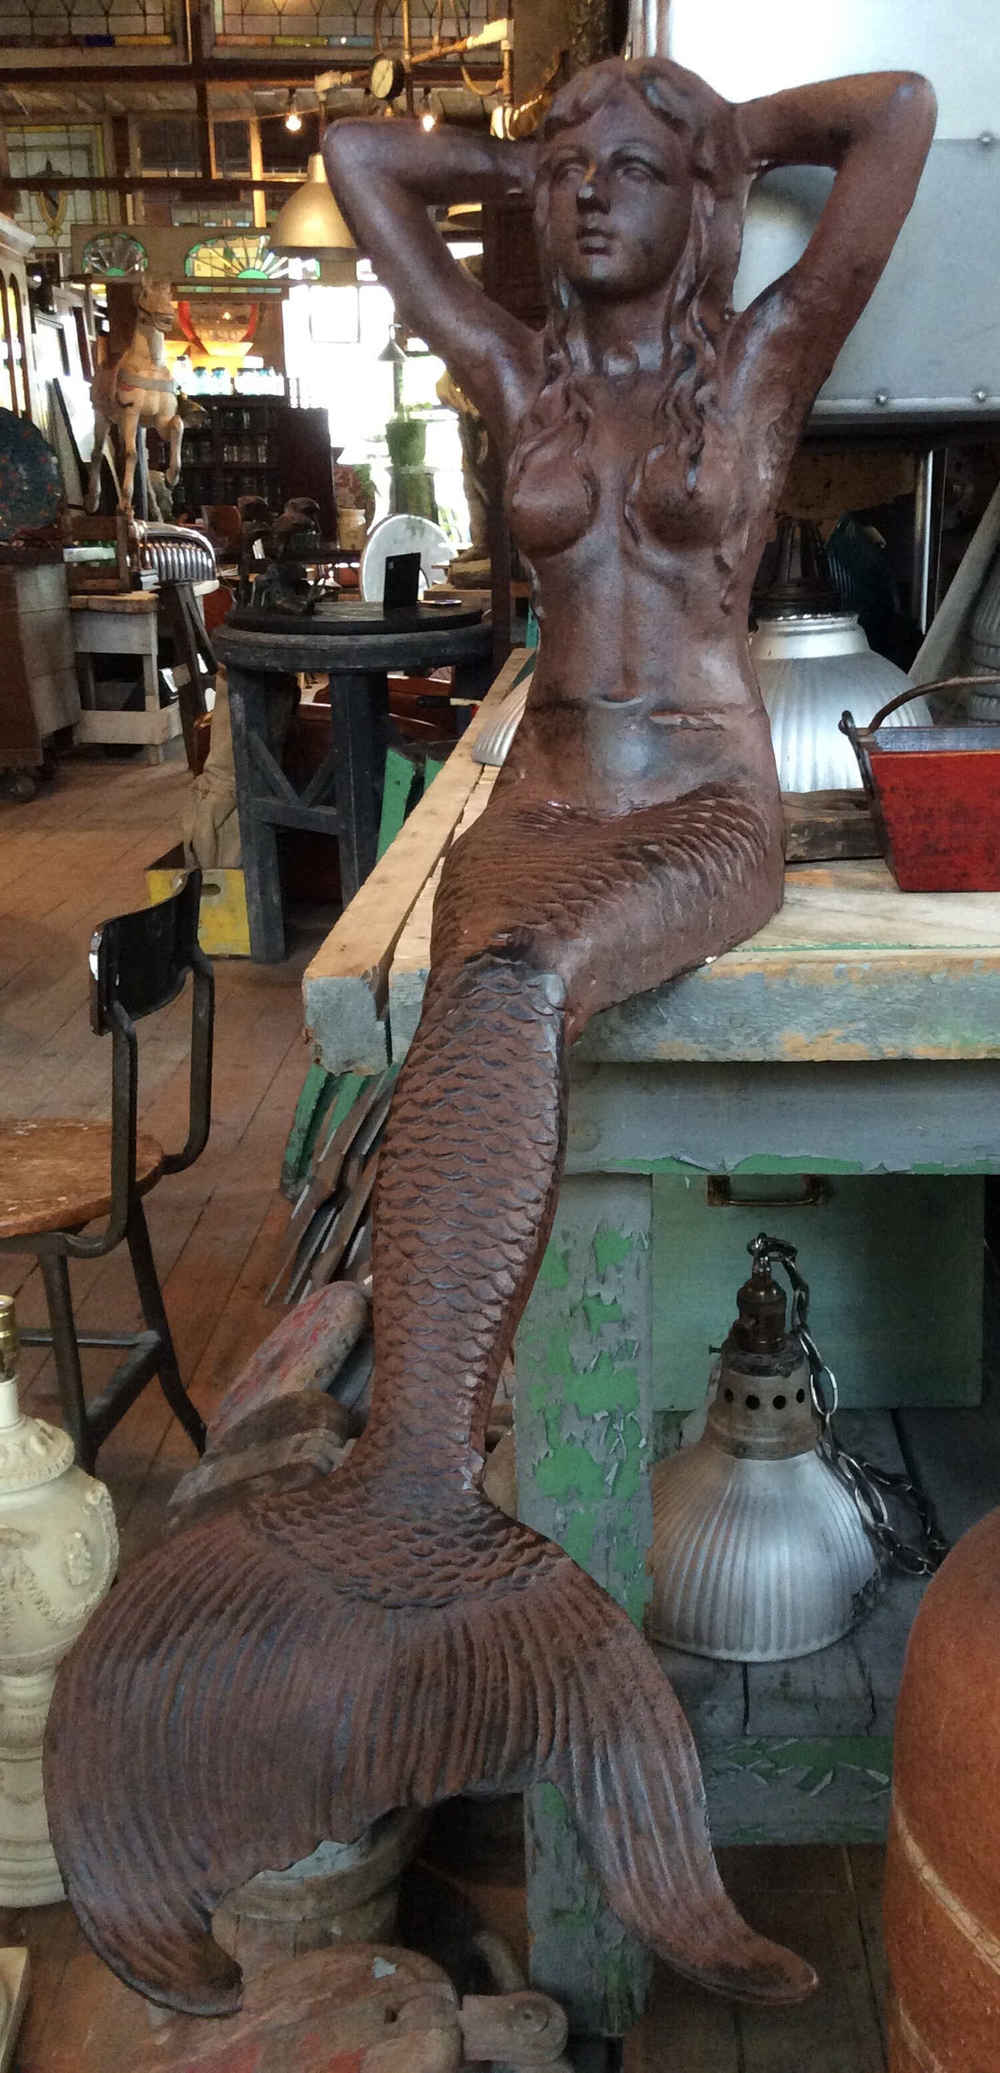 SOLD! Sitting Mermaid Statue